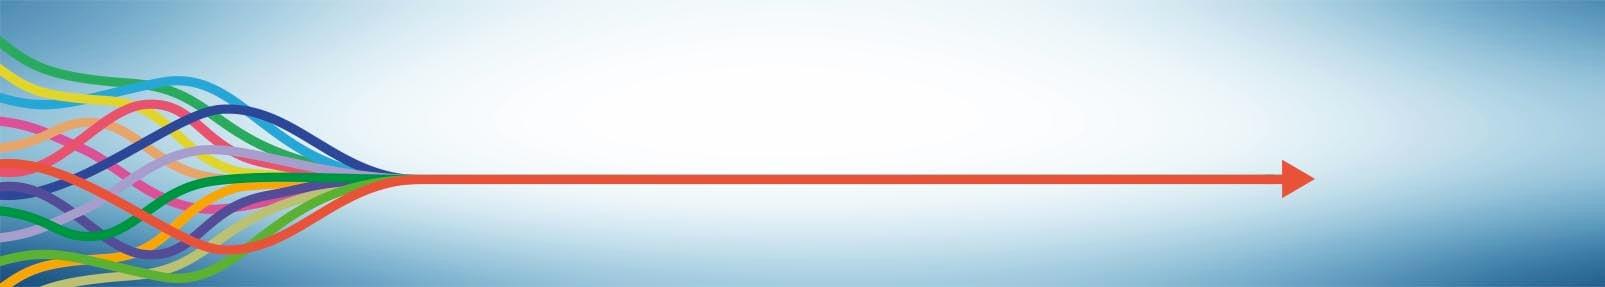 DW_SmartDocumentControl_Website_Header-Image_red